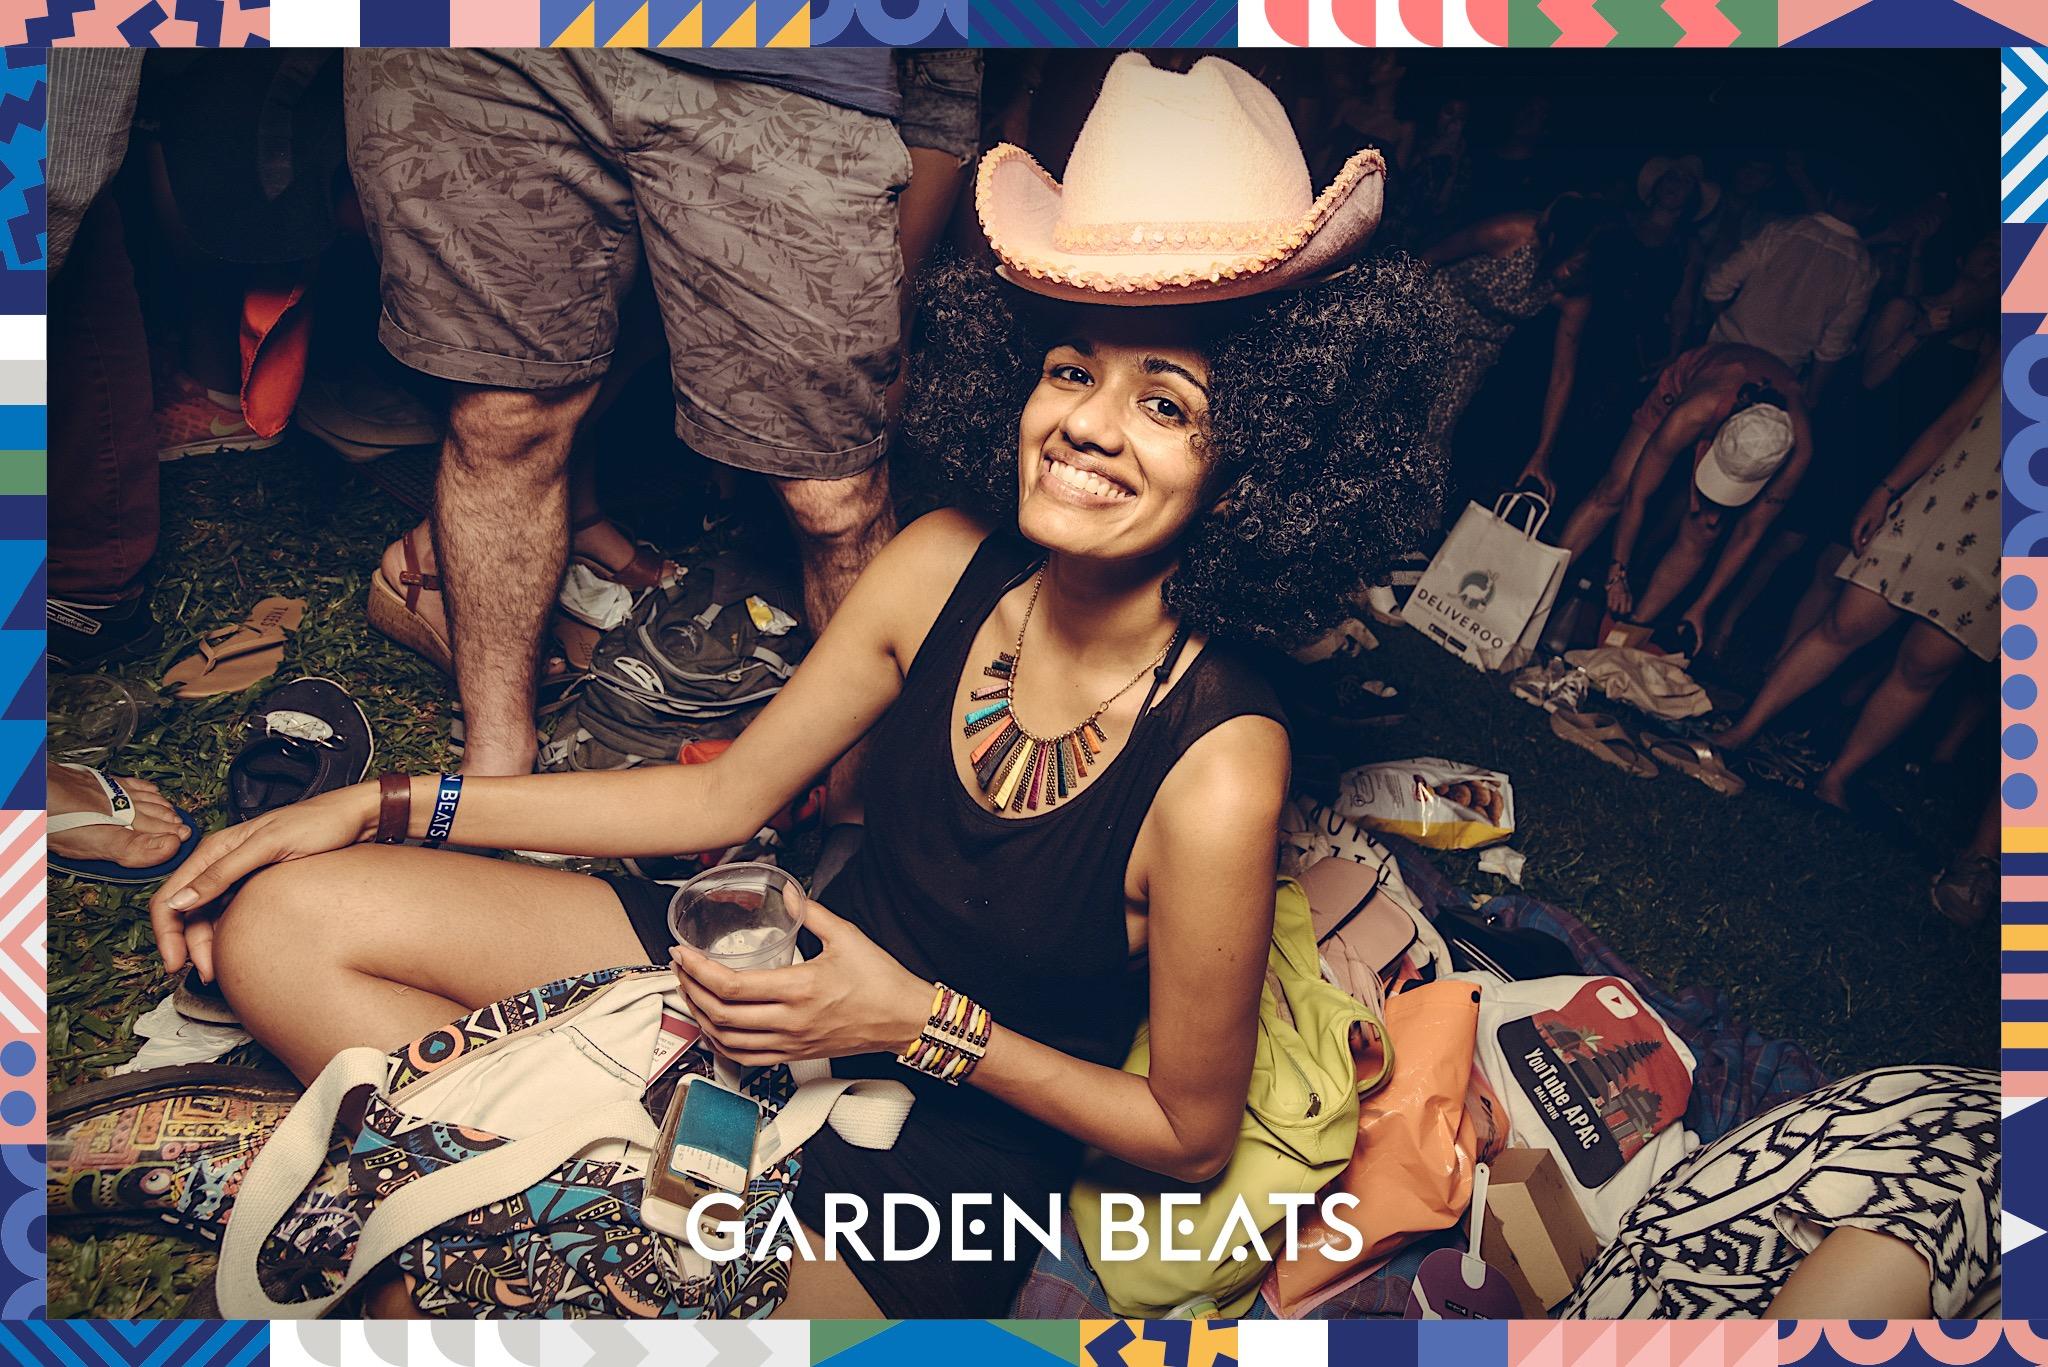 18032017_GardenBeats_Colossal733_WatermarkedGB.jpg